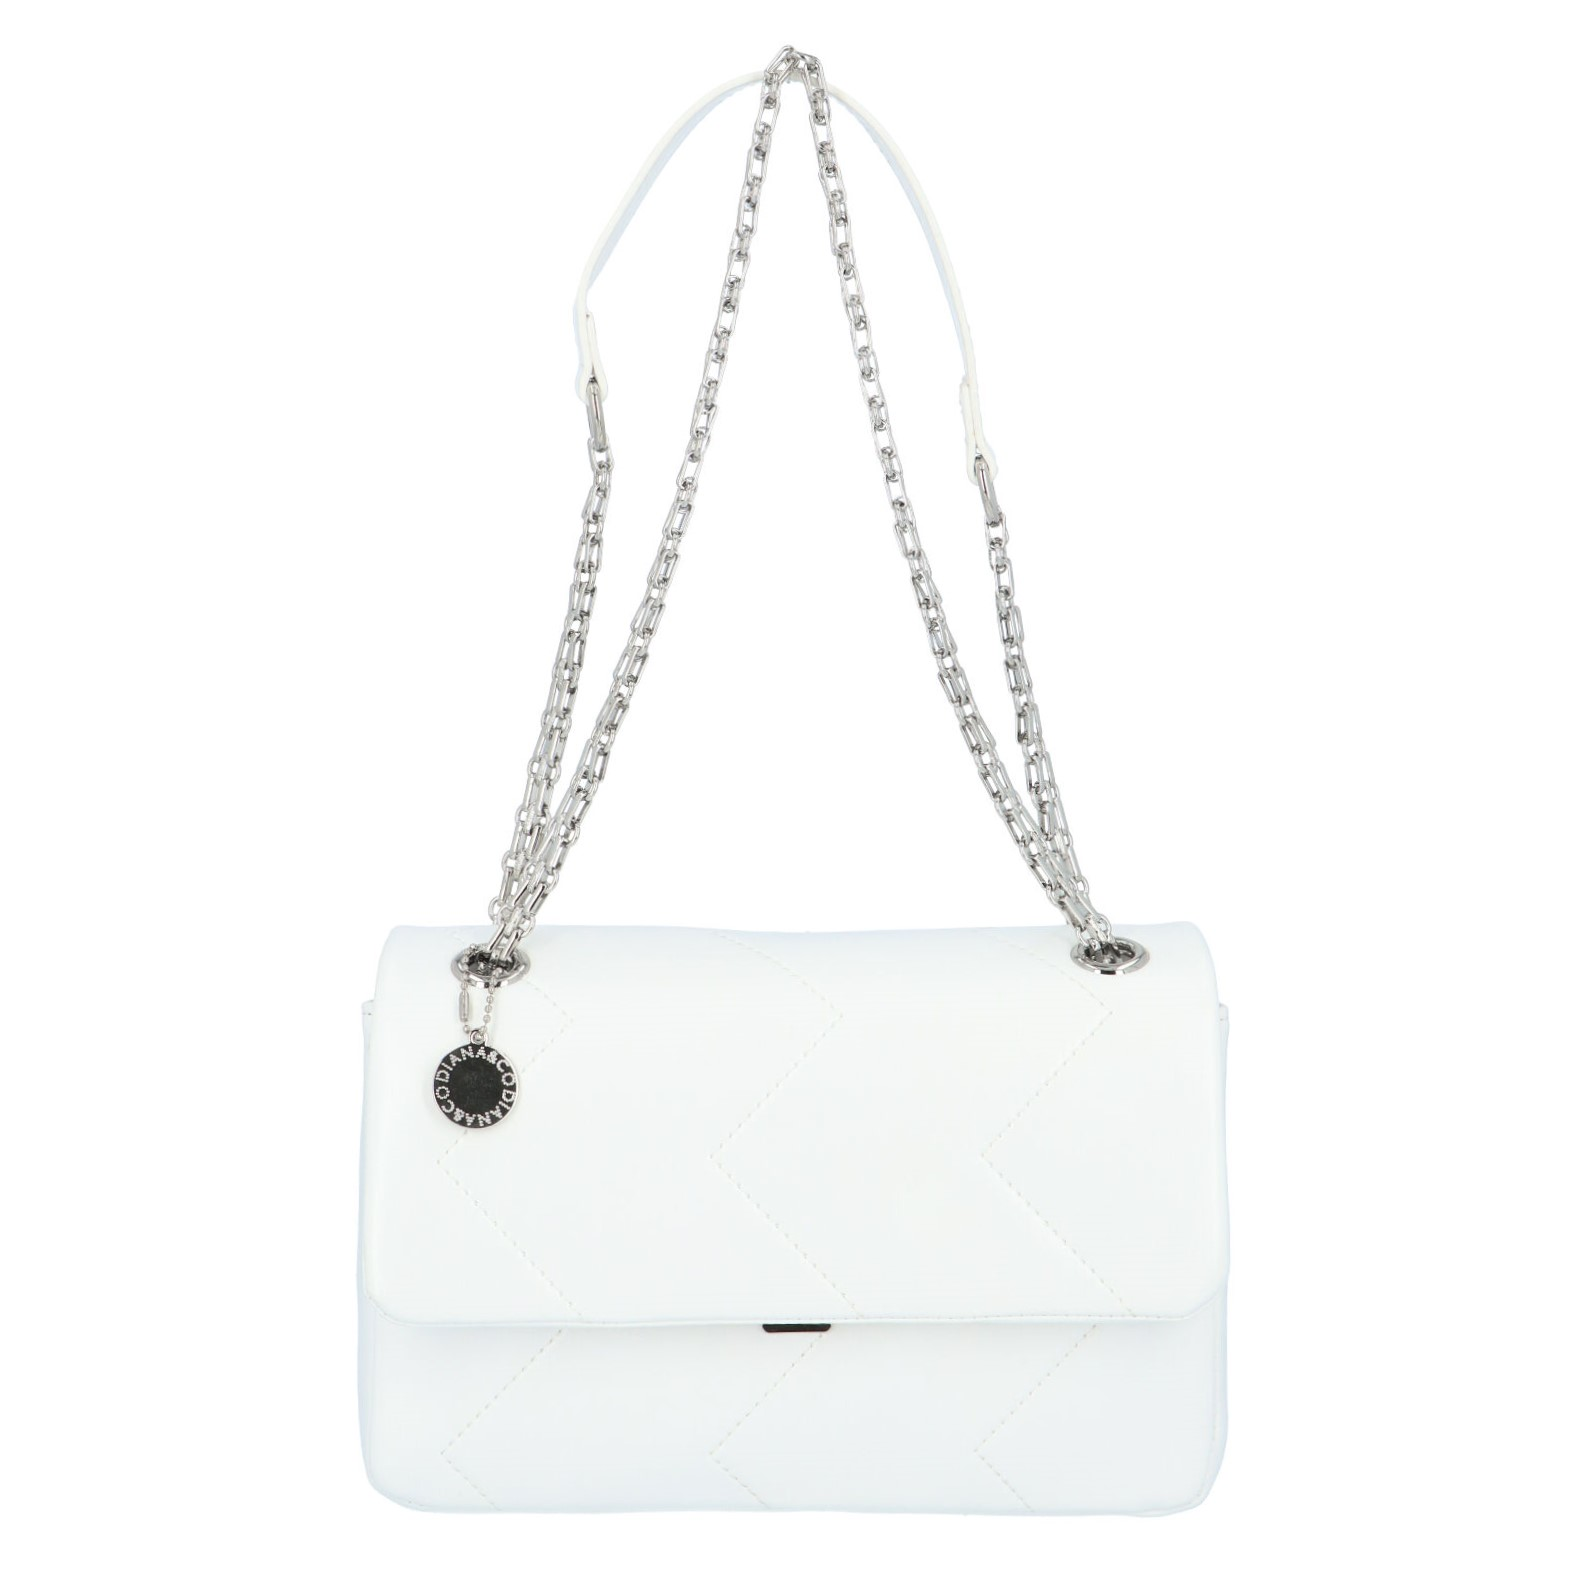 Dámská kabelka přes rameno bílá - DIANA & CO Threethre